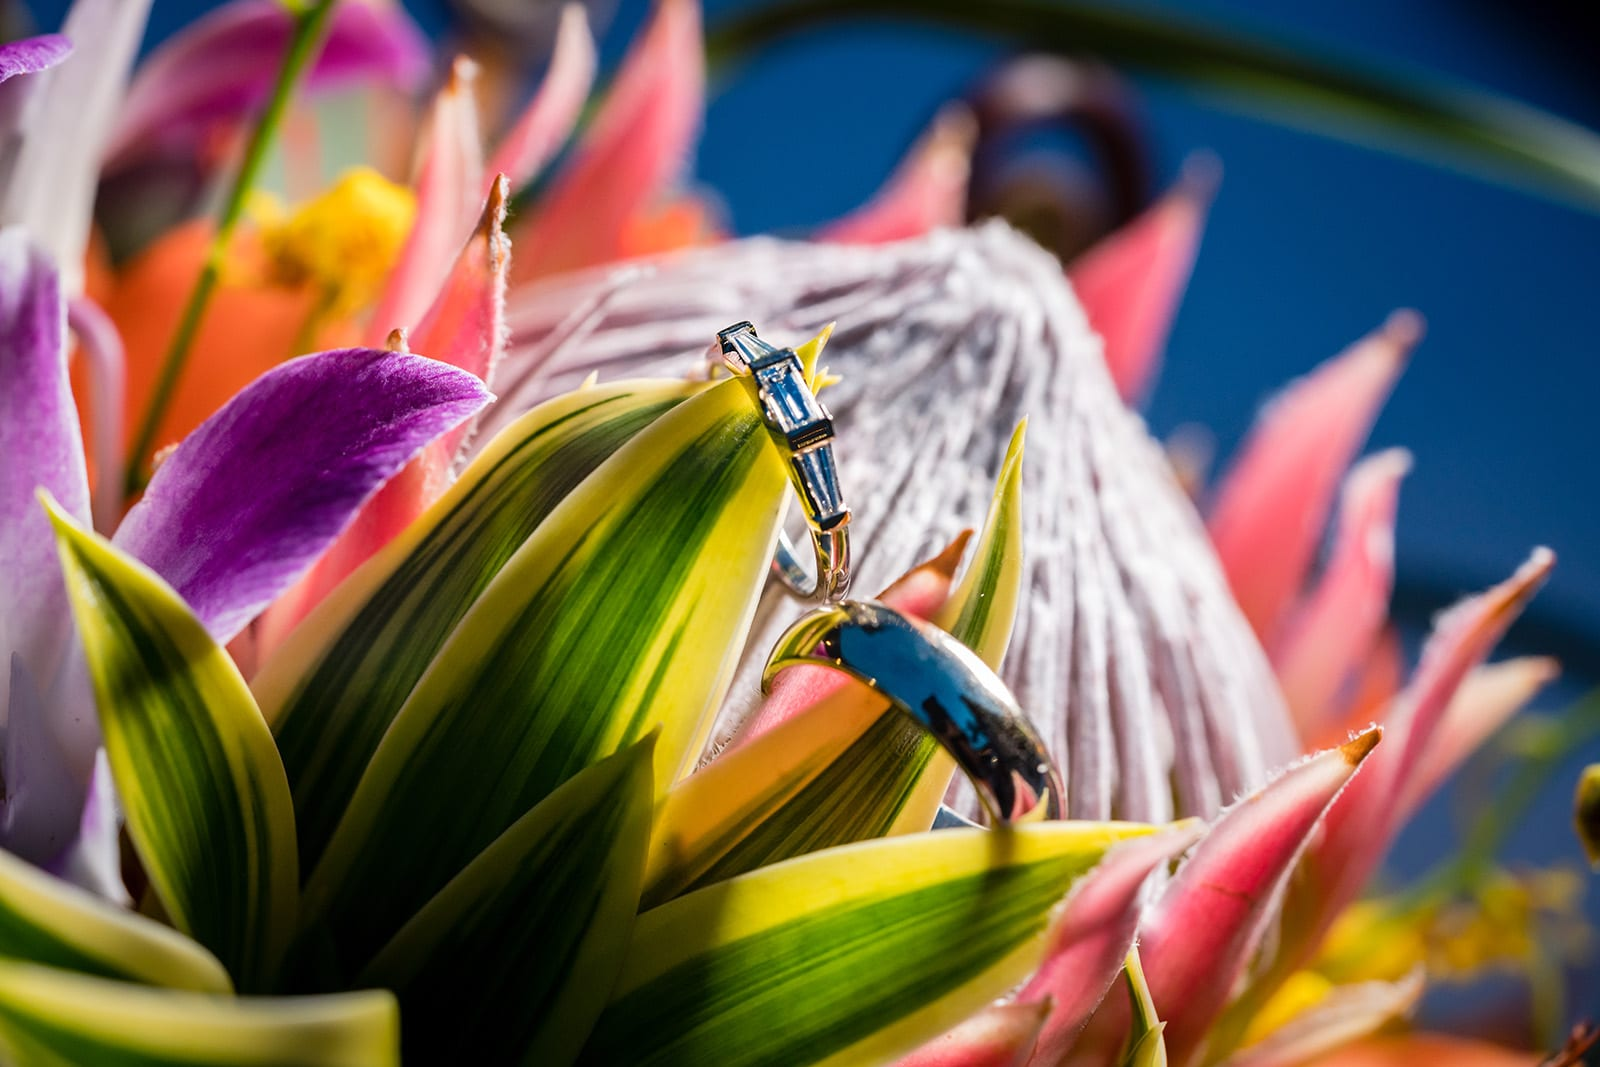 Hawaii-Wedding-Photographer-Ring-Details-Engagement-Ring-Off-camera-flash-macro-3.jpg